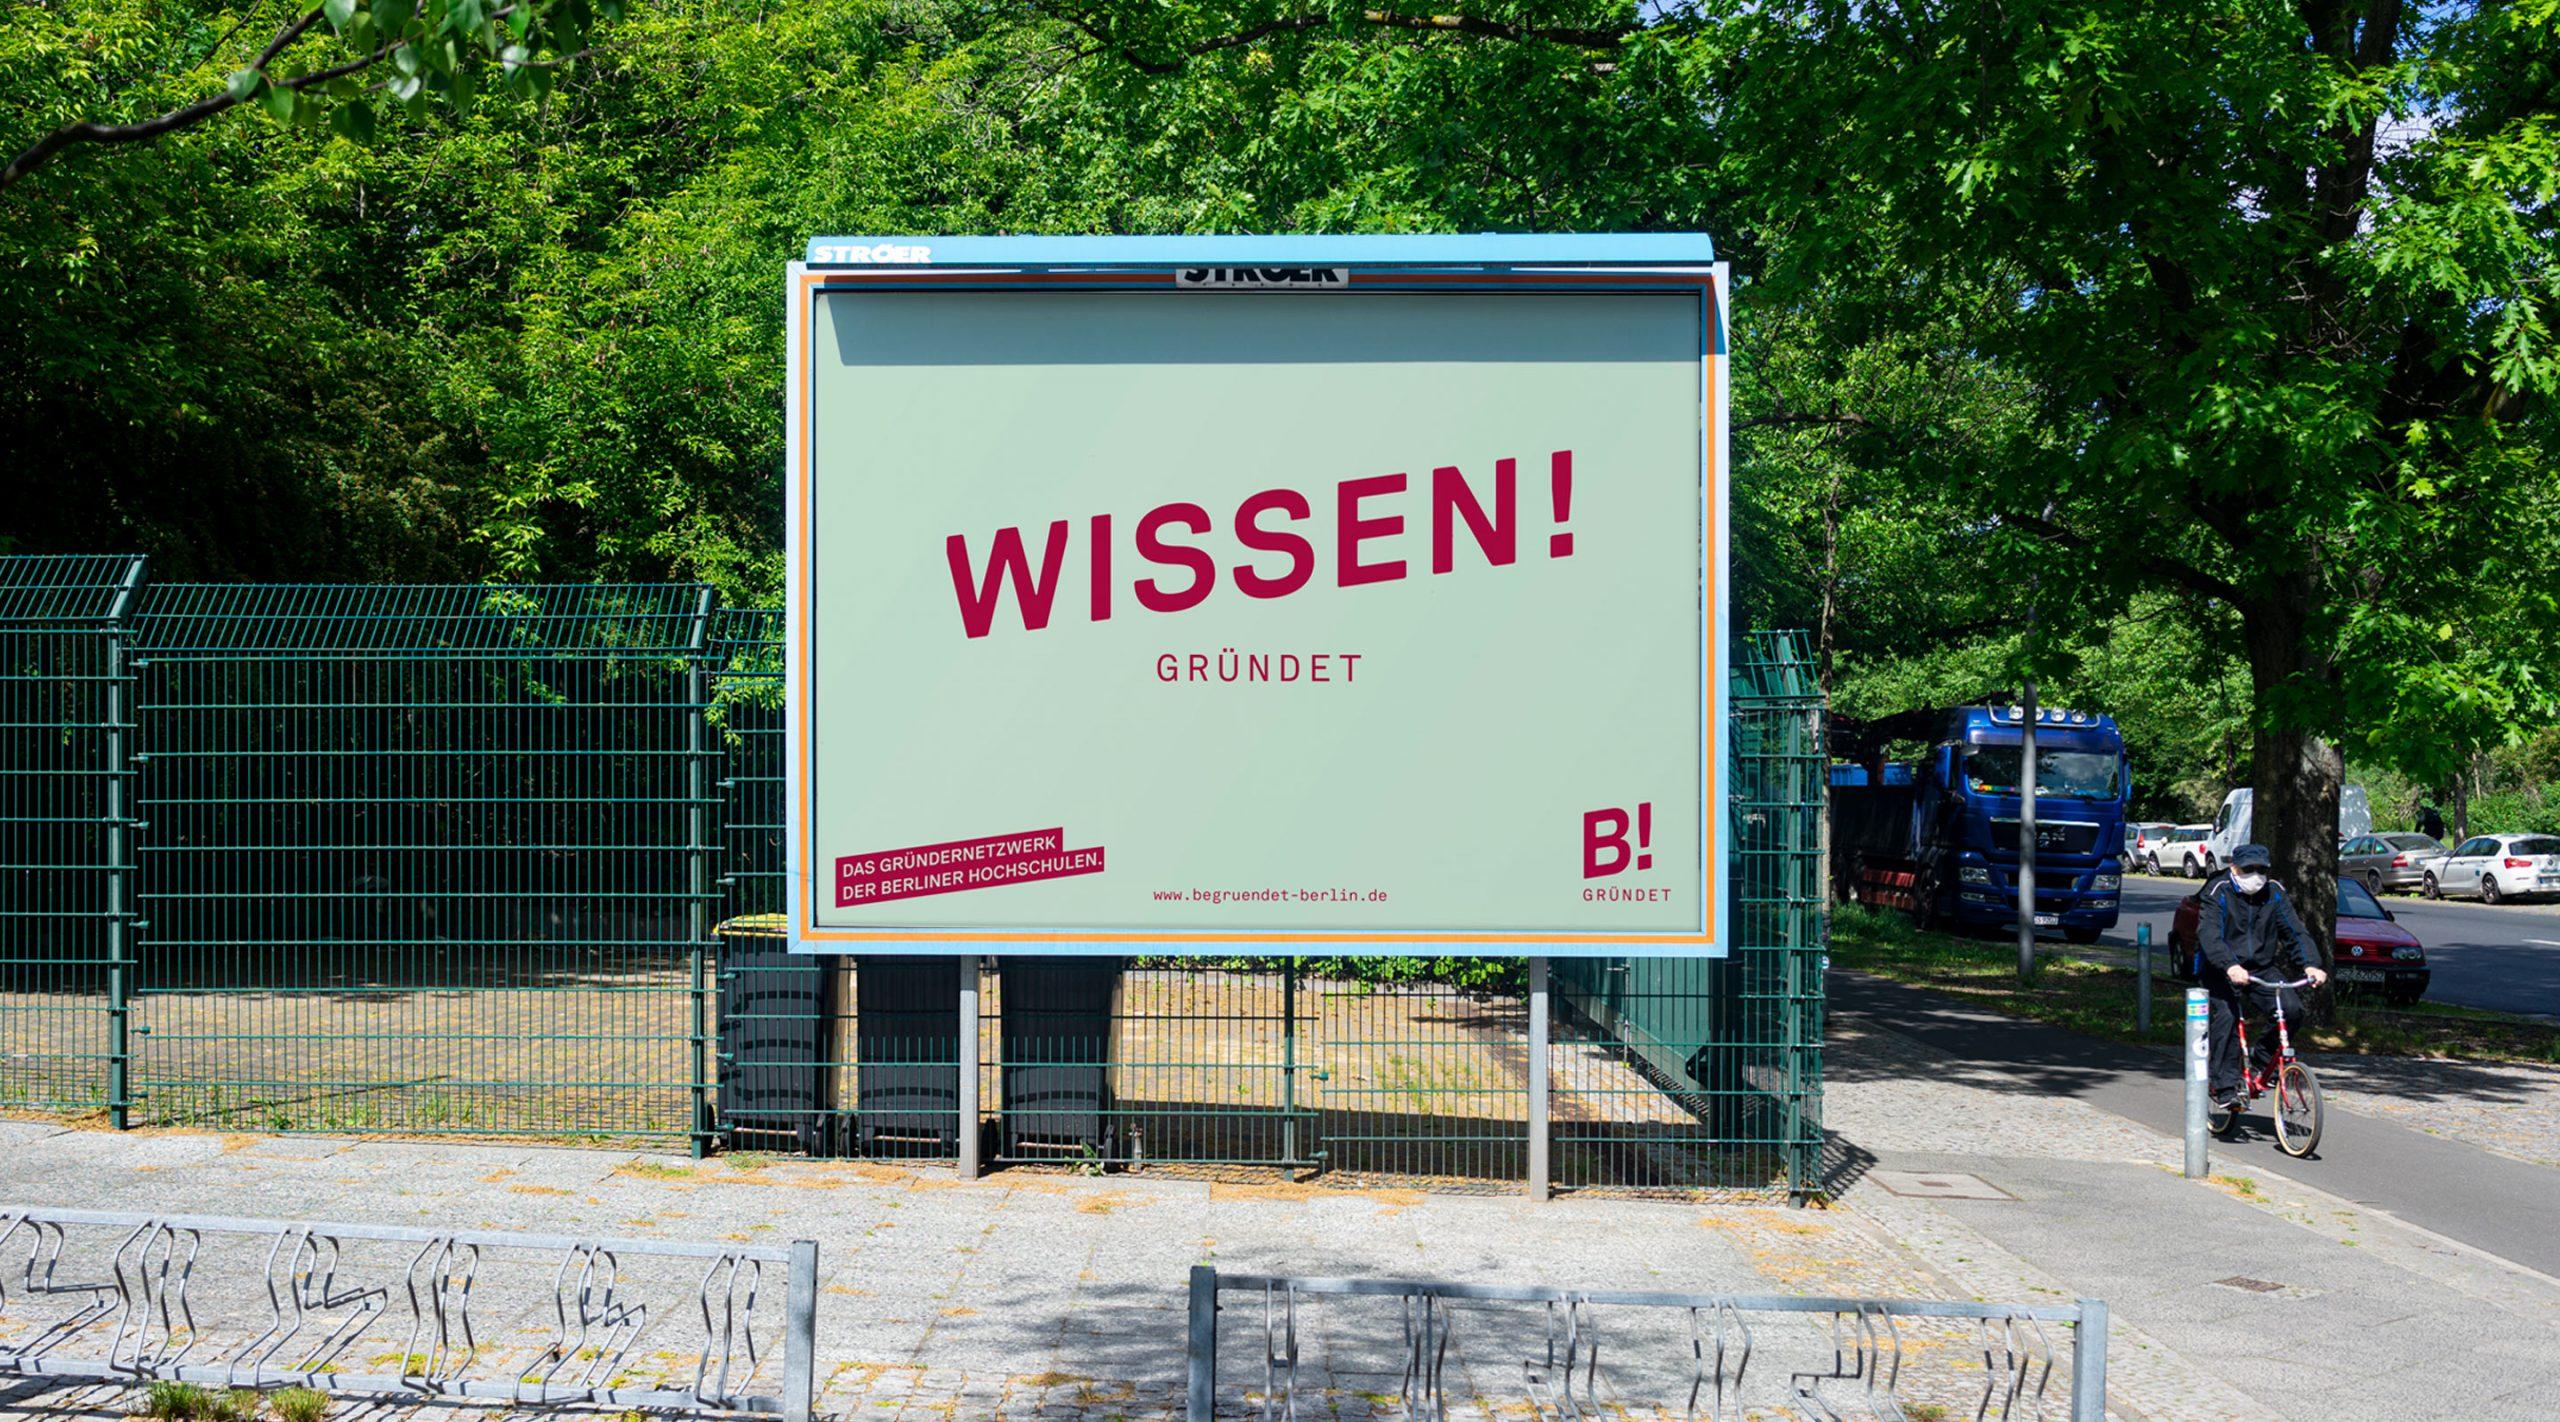 Begründet Berlin Branding – Wissen! gründet als Poster – Uthmöller und Partner